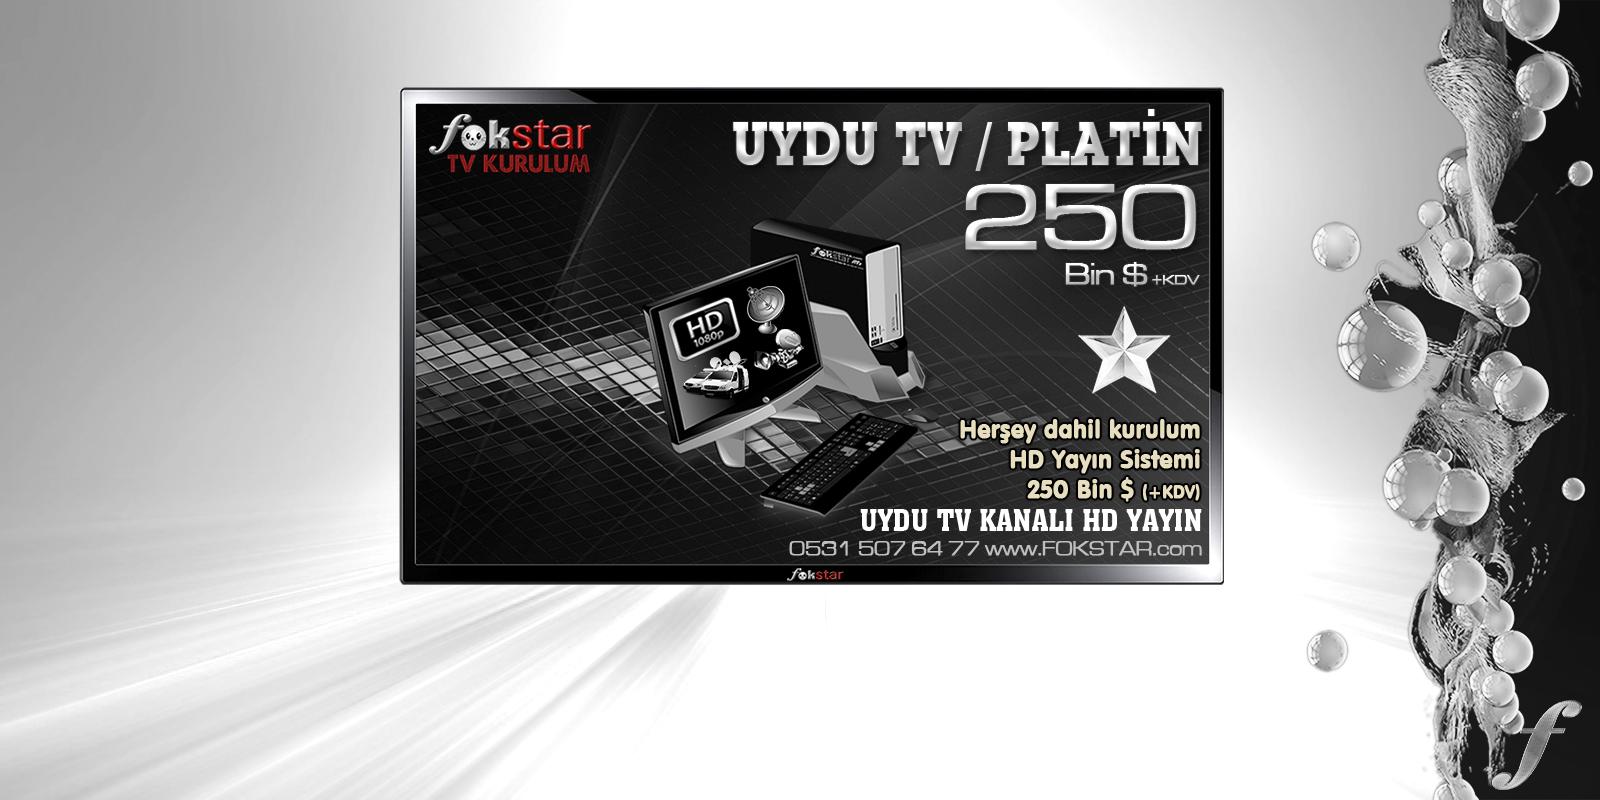 UYDU TV PLATİN